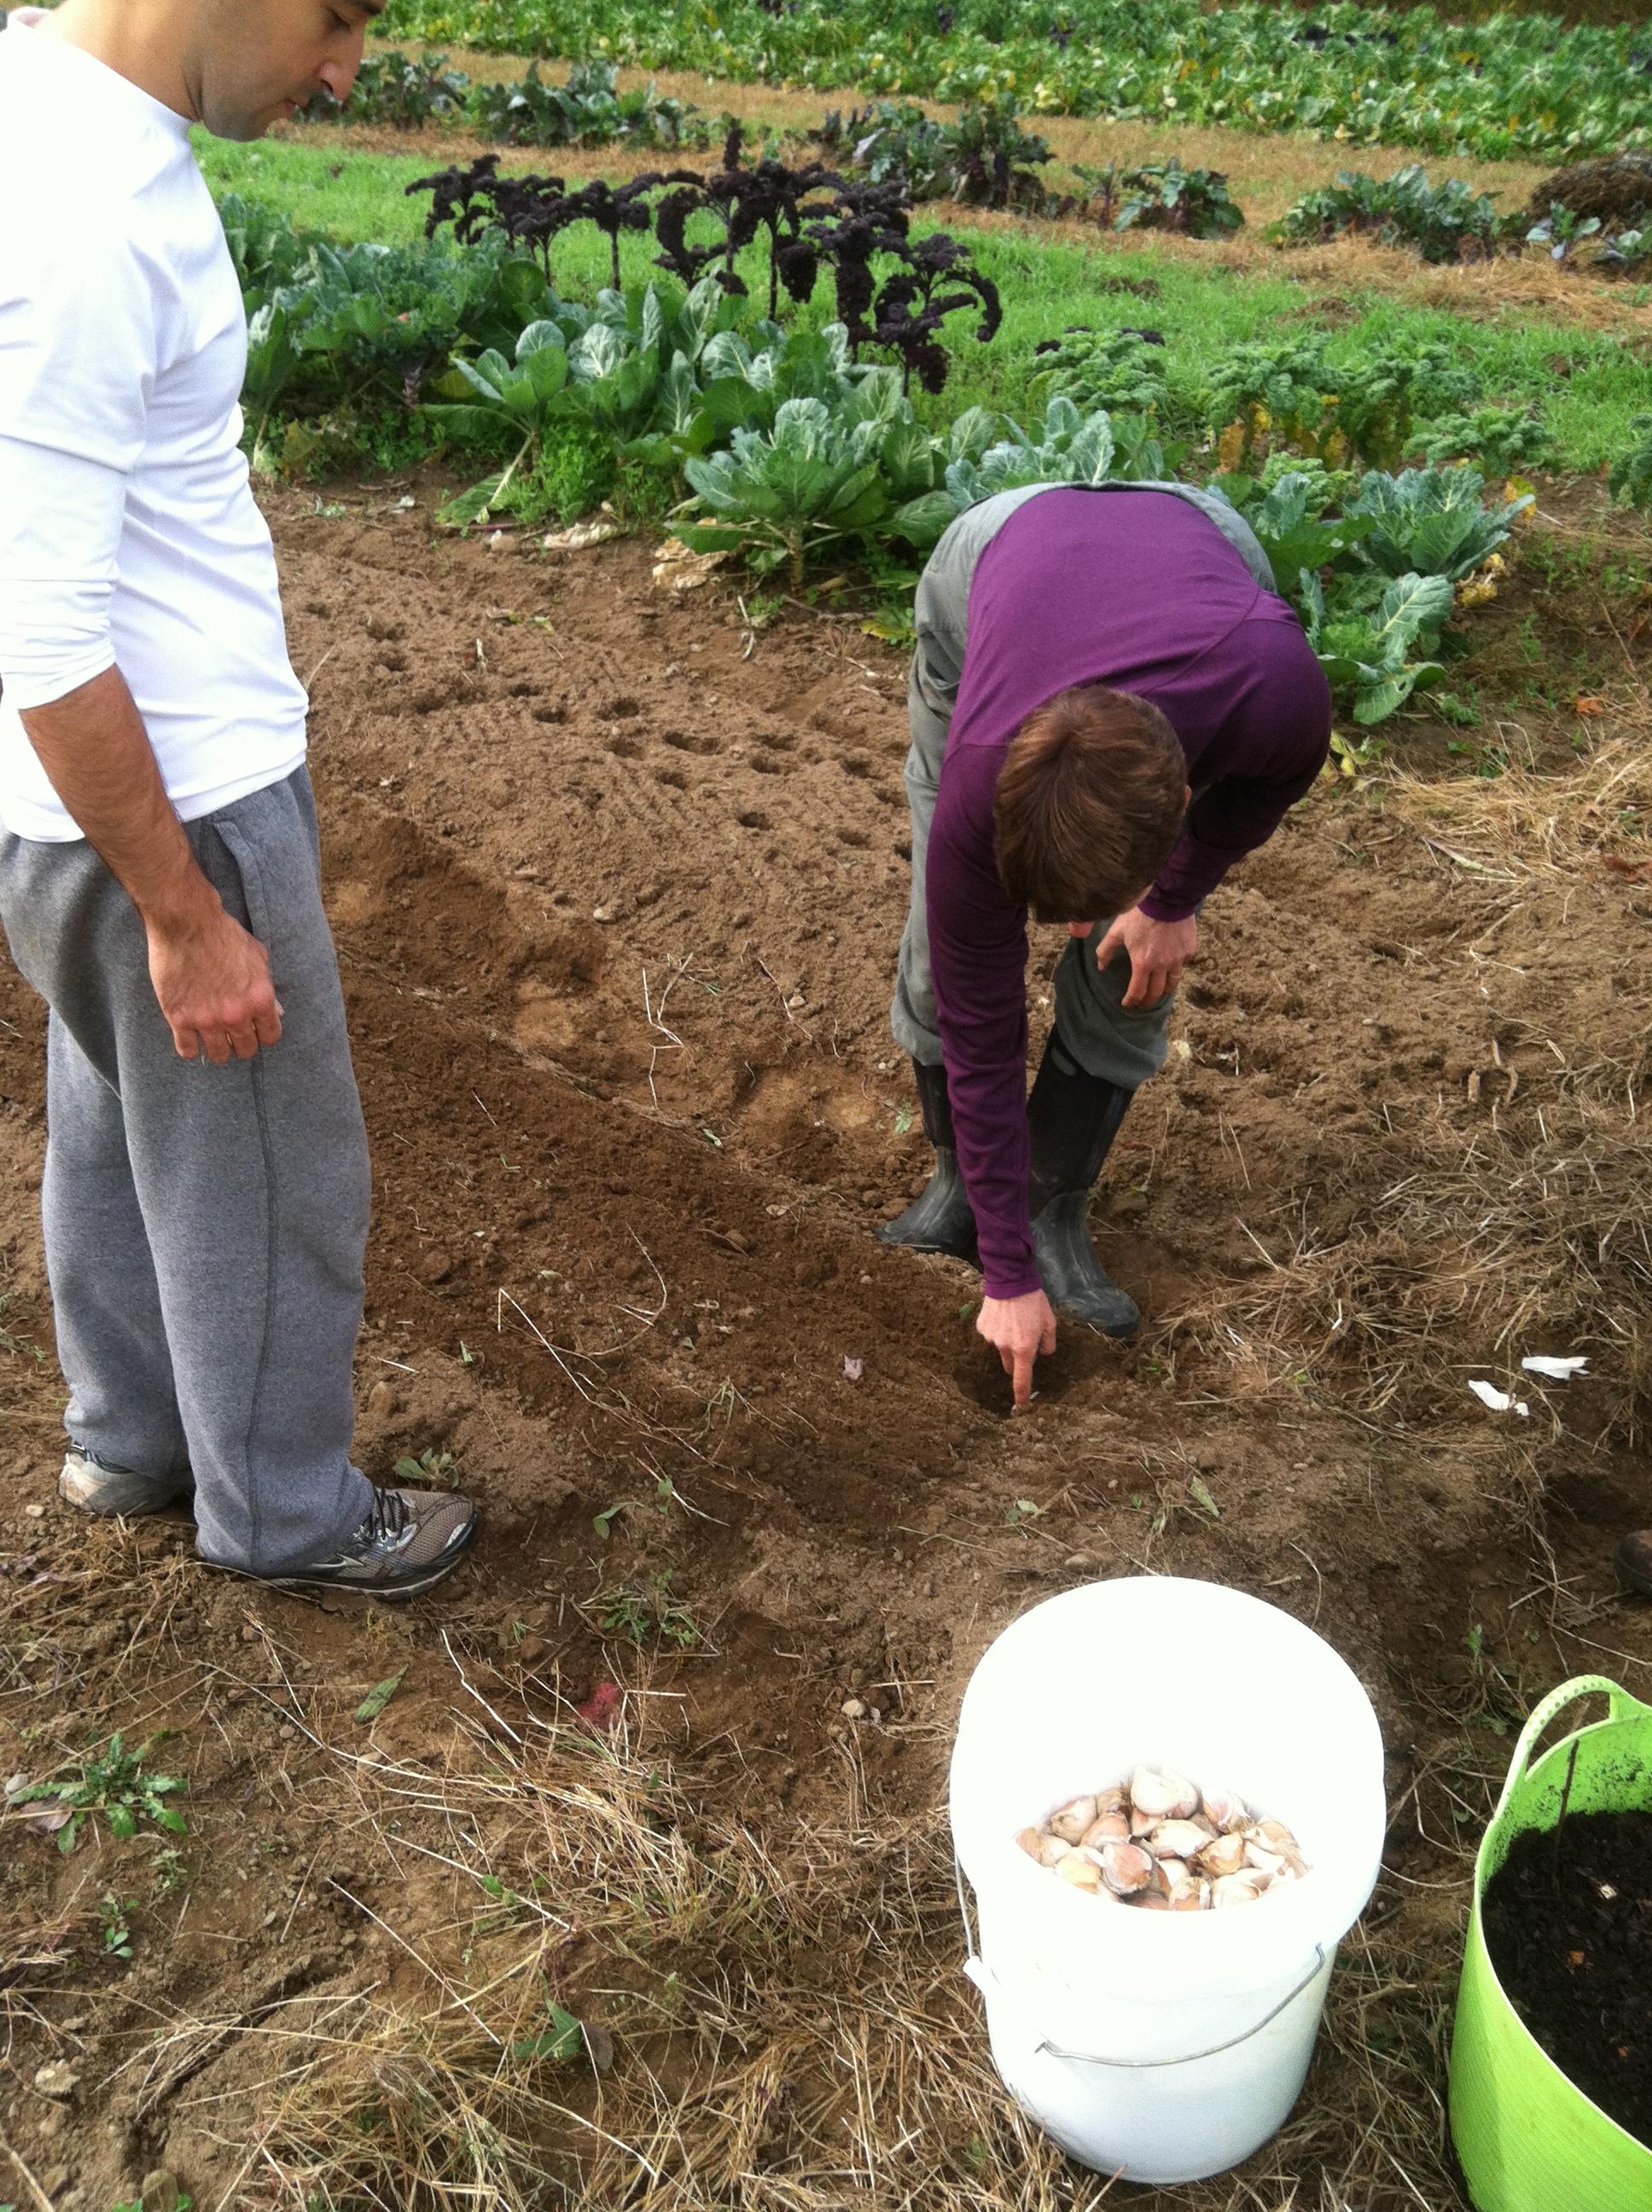 Planting cloves